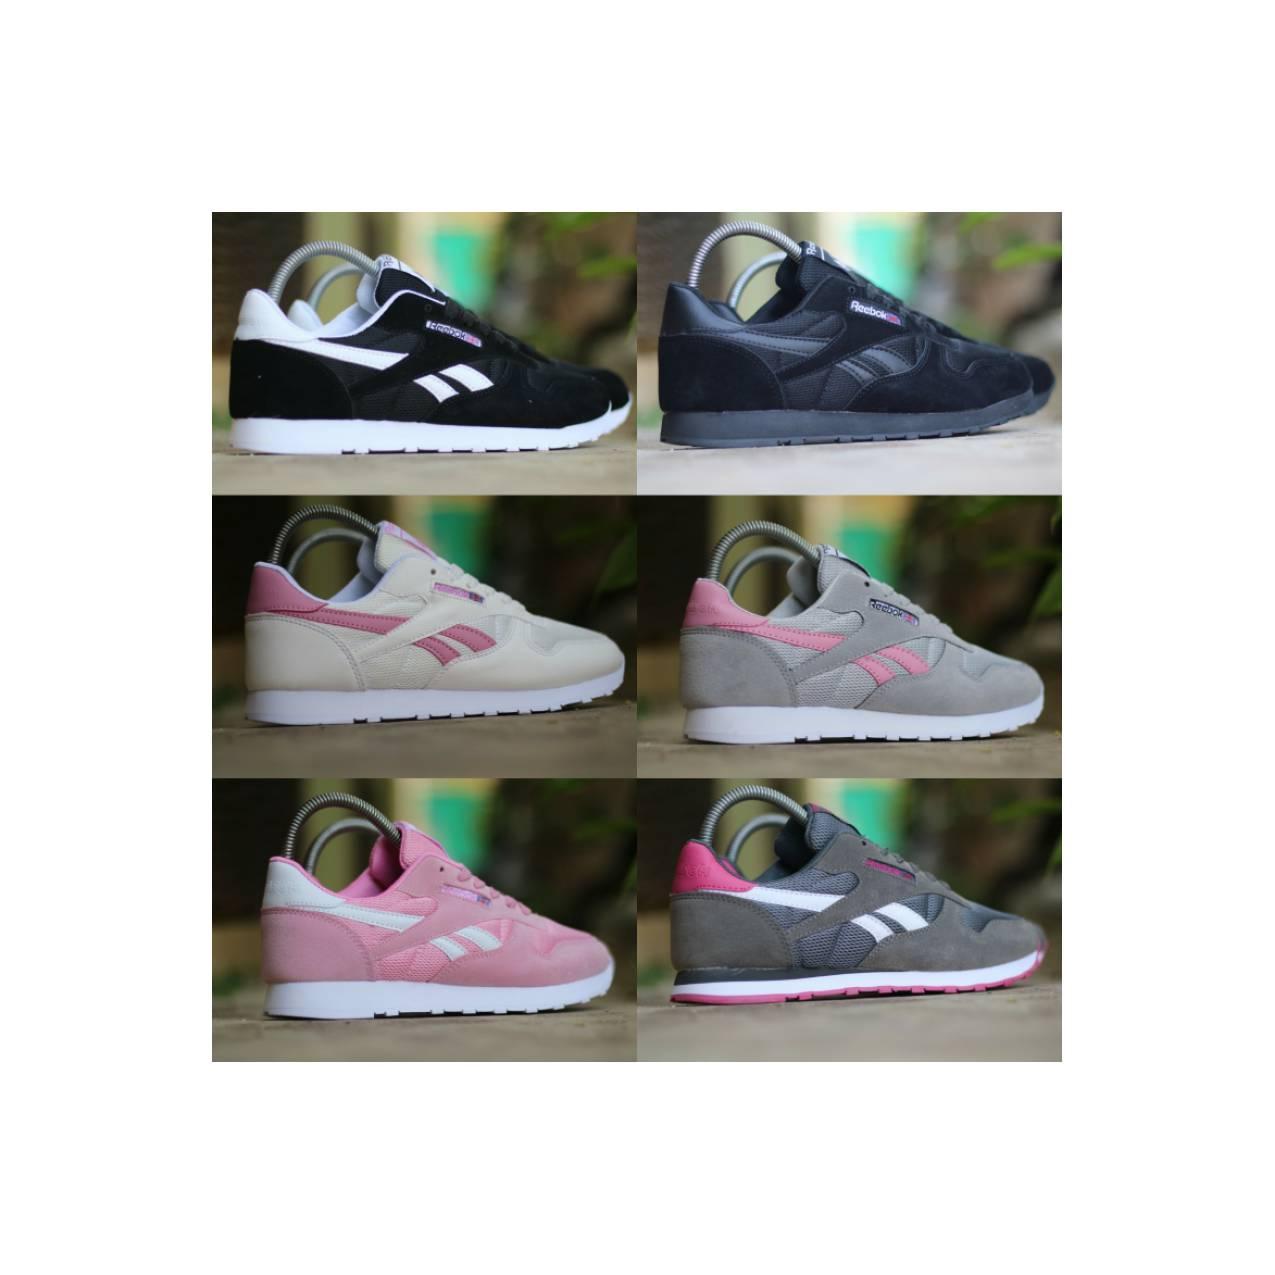 Reebok Classic size 36 - 40 sepatu wanita sneakers casual pink abu